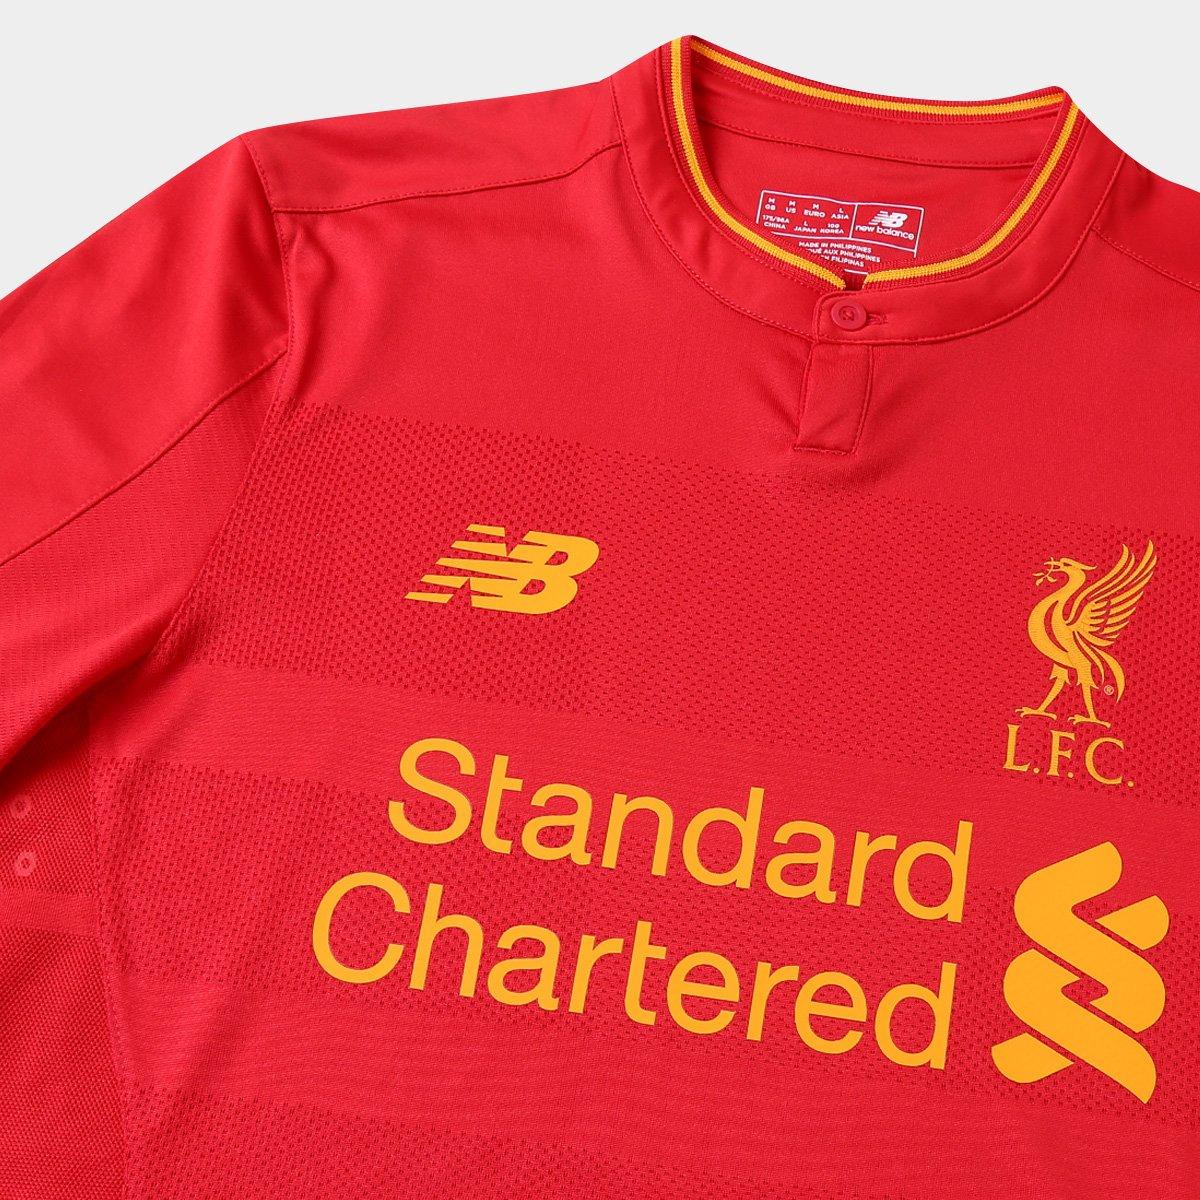 27aaf268d8 Camisa Liverpool Home16 17 s nº Torcedor New Balance Masculino ...